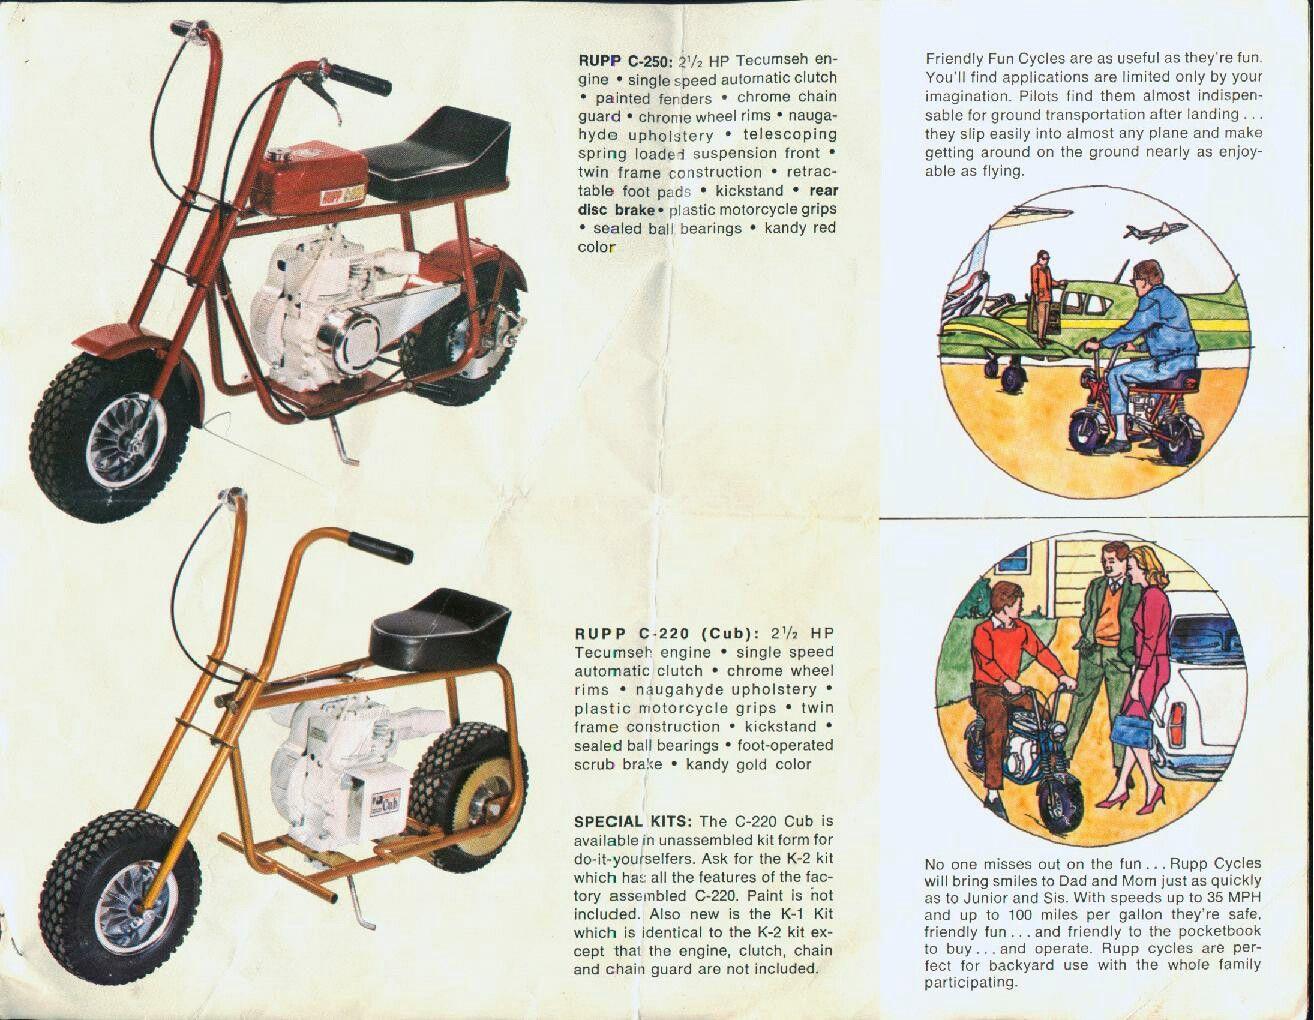 Vintage Mini Bikes Oldminibikes Com Rupp Vintage Mini Bike